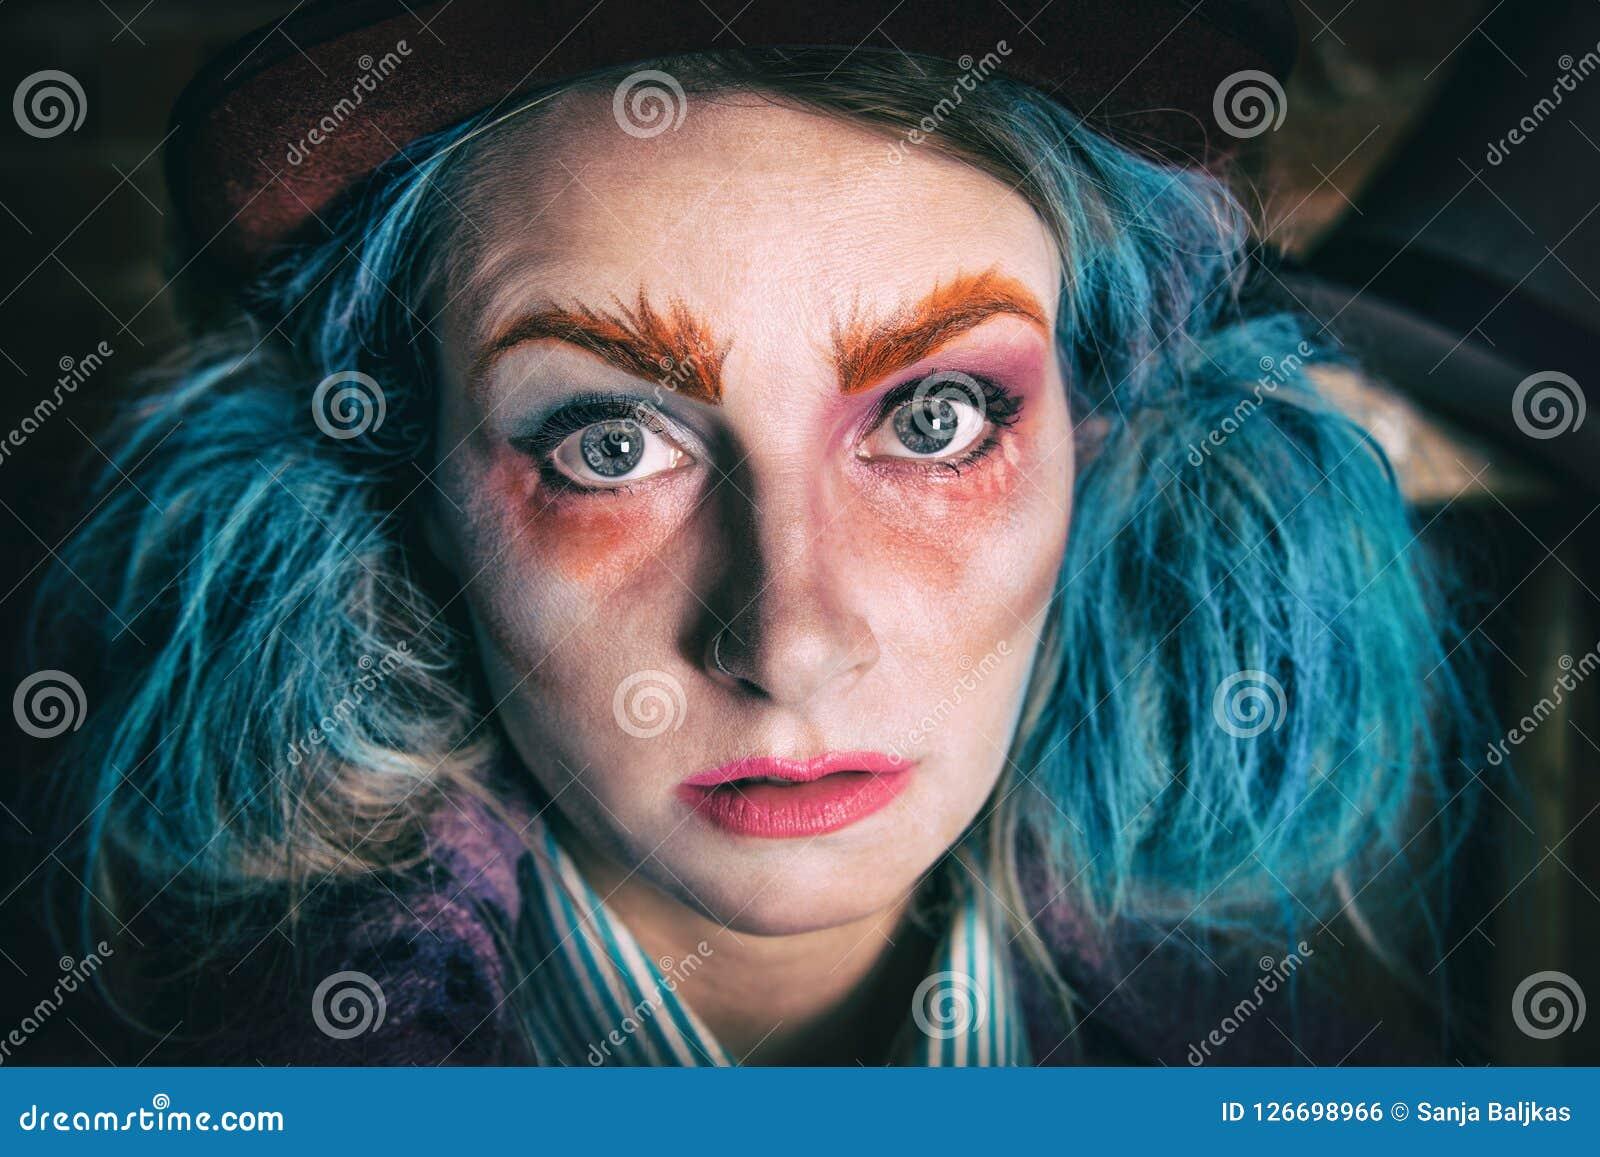 Mad Hatter close up - Alice in Wonderland